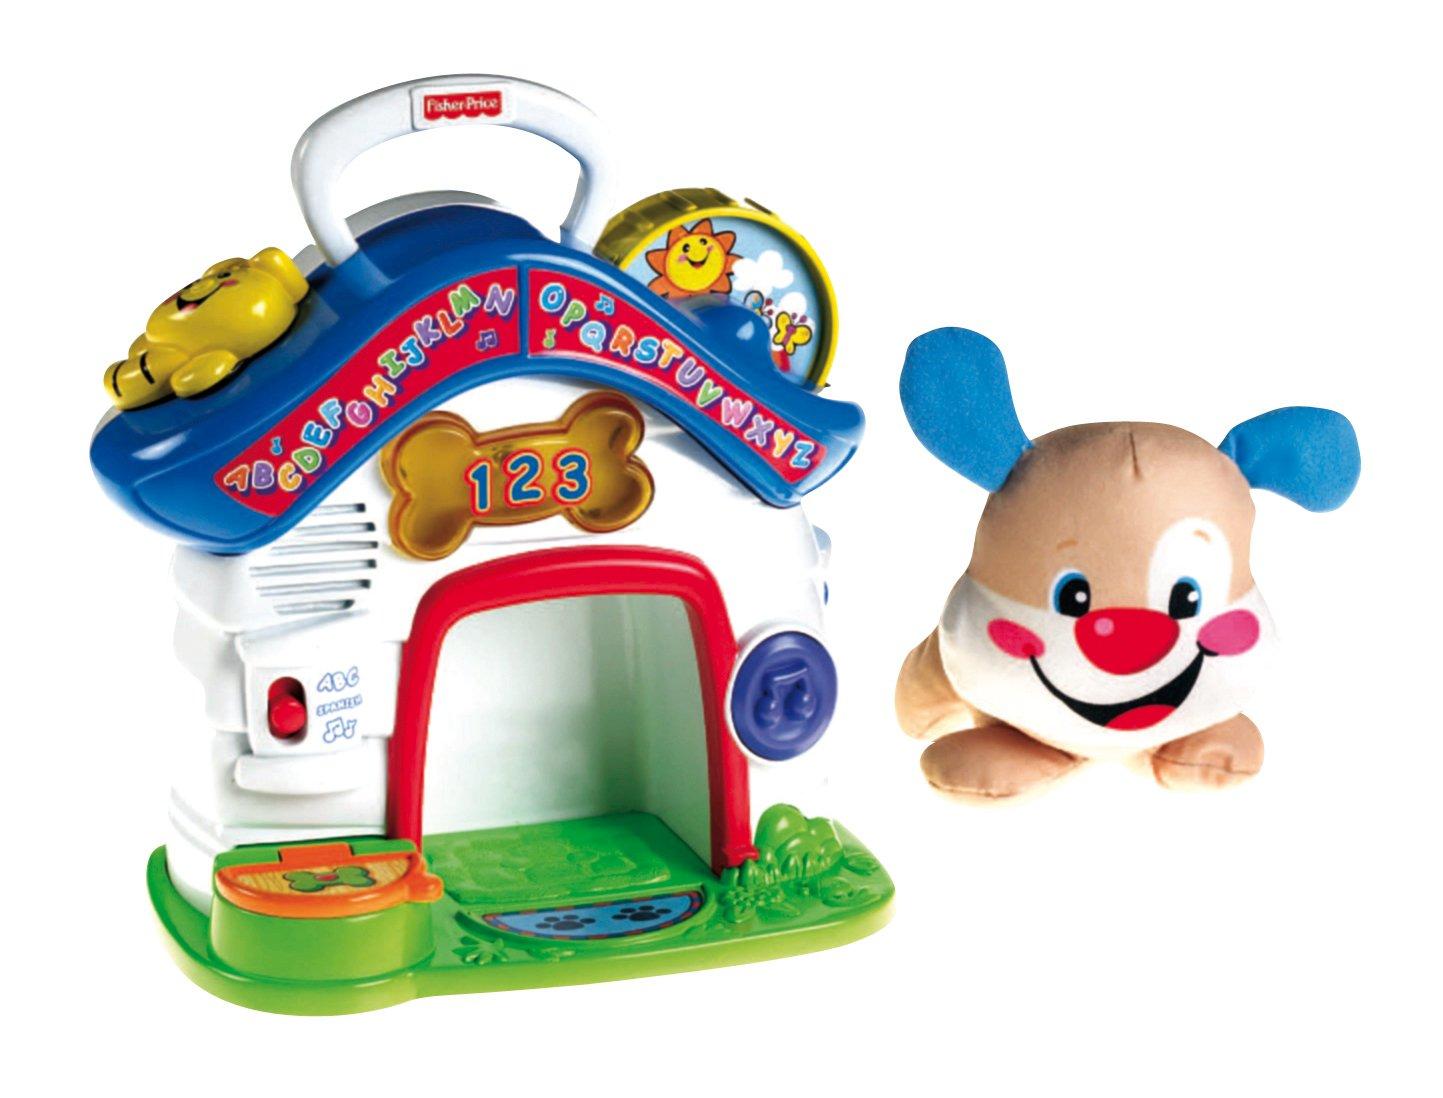 Fisher Price W Fp Caseta Perrito Aprendizaje Mattel